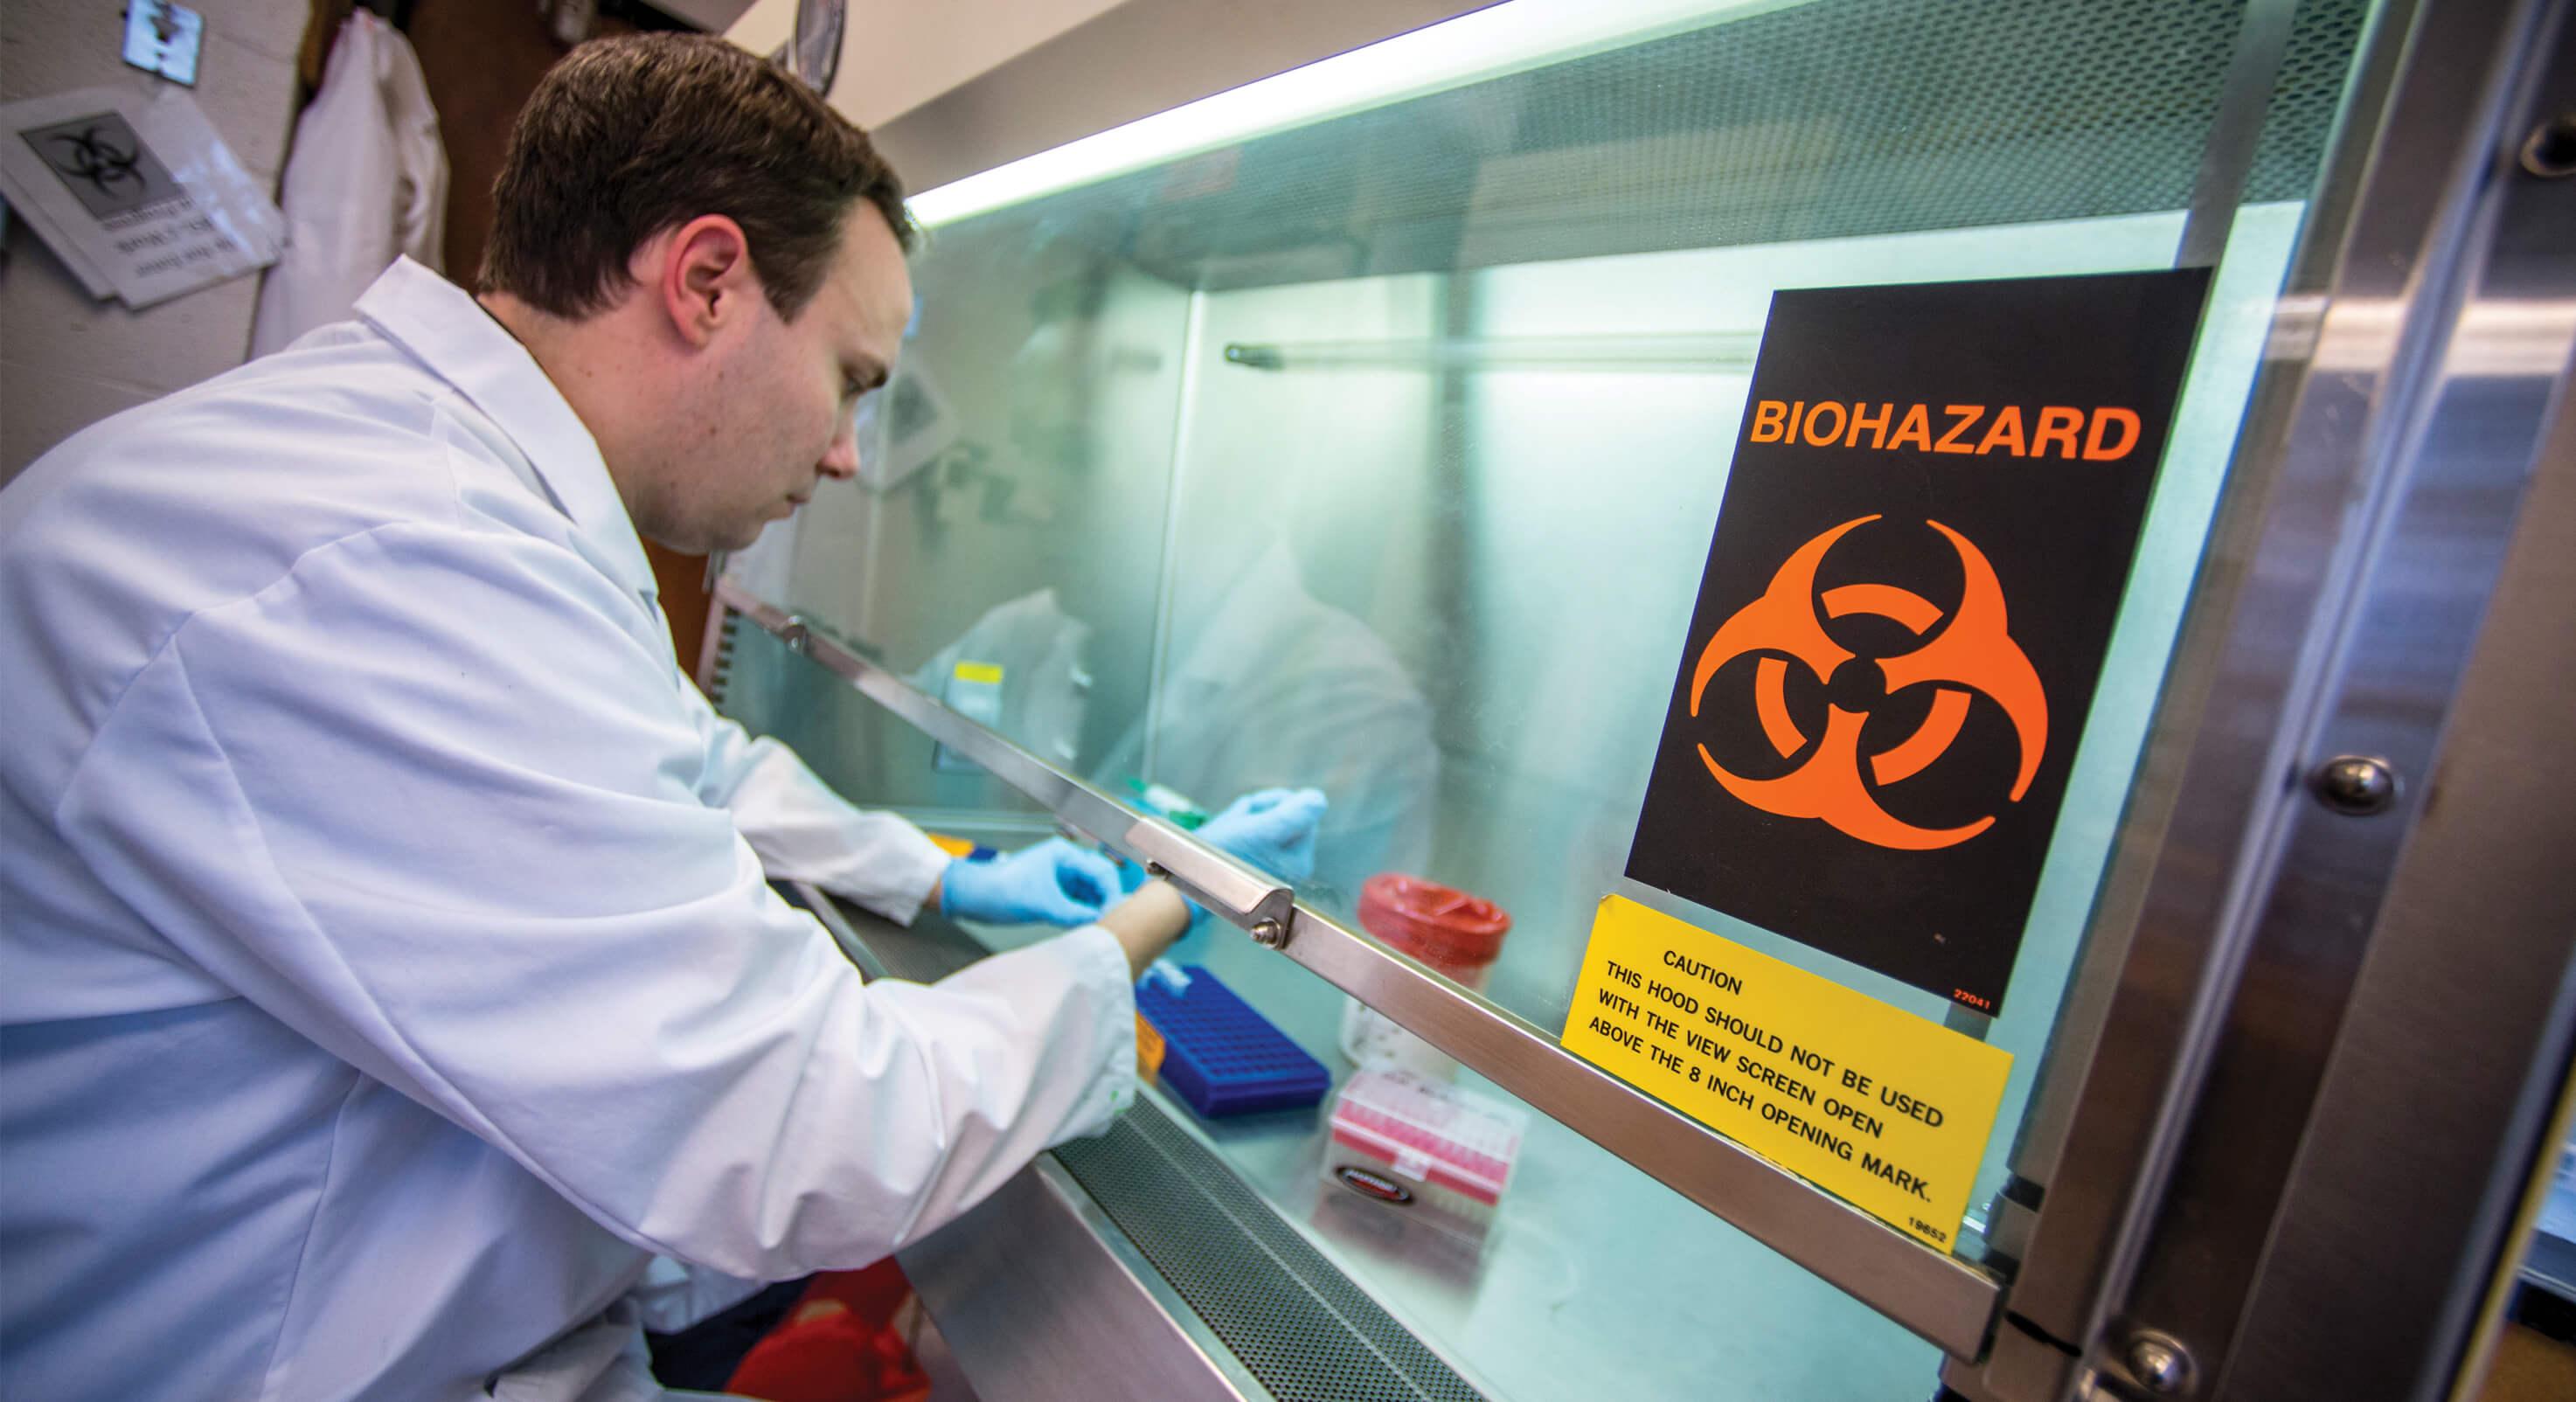 Biohazard-1-1-1